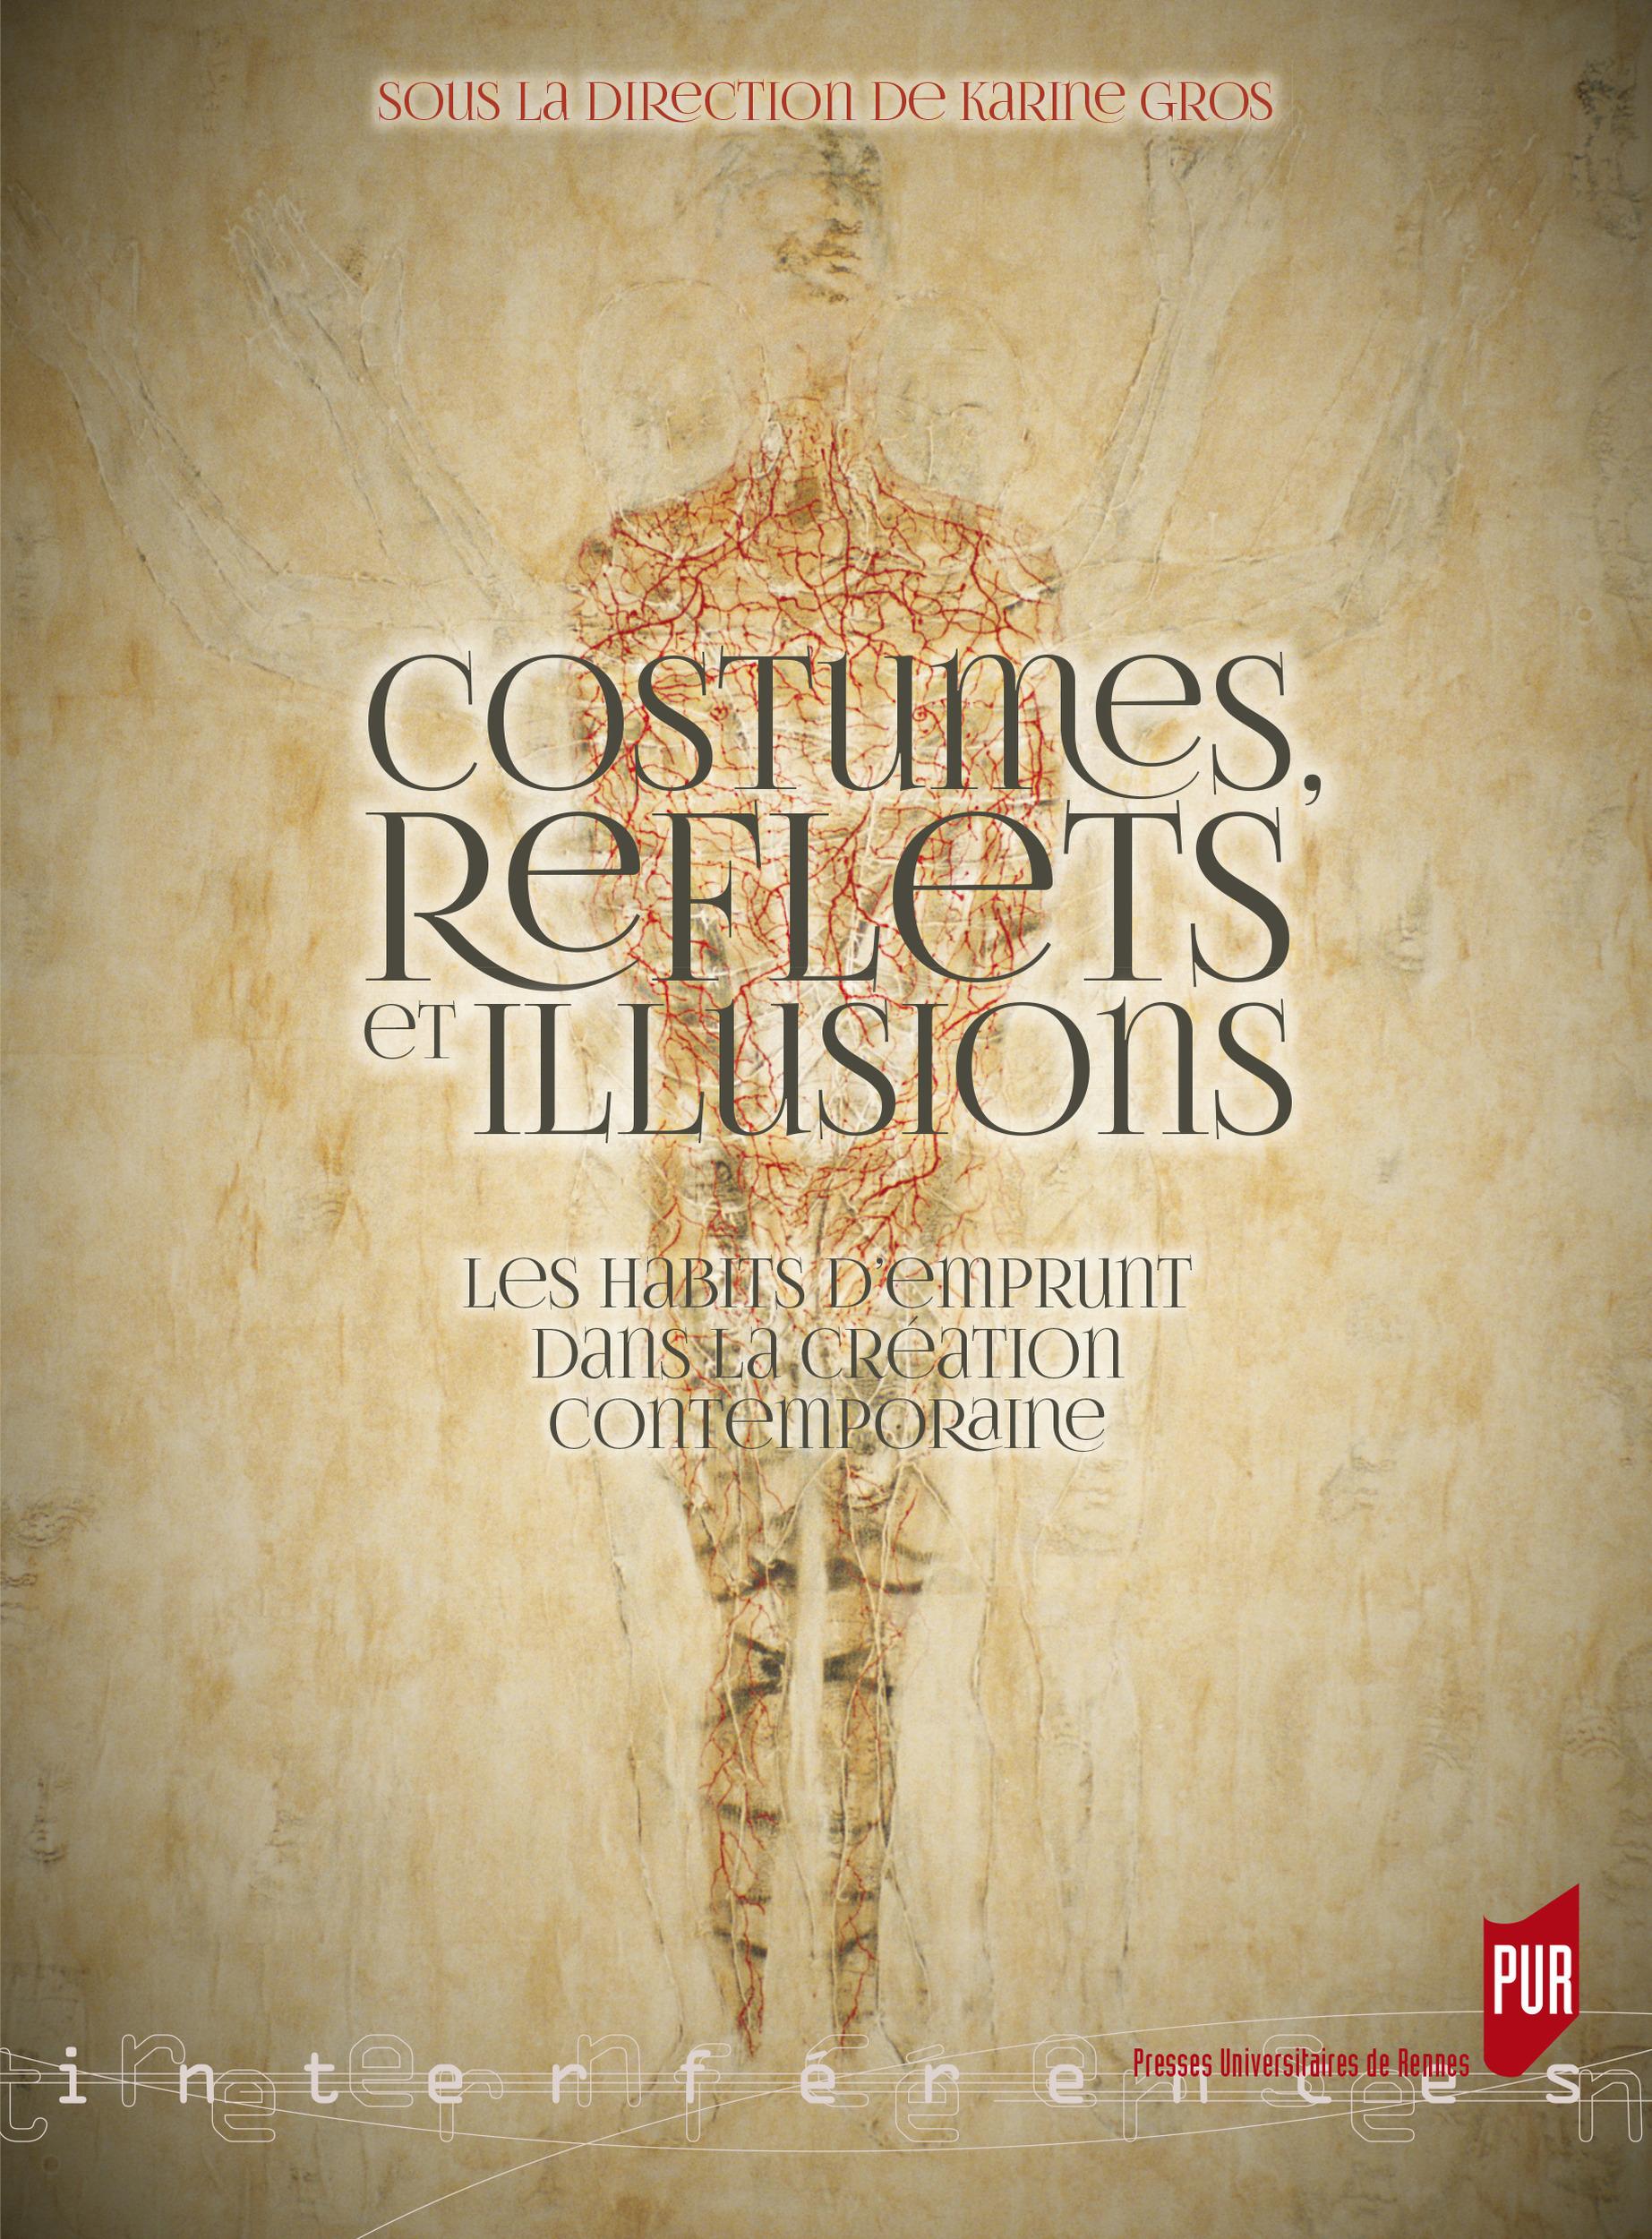 Costumes, reflets et illusions  - Karine Gros